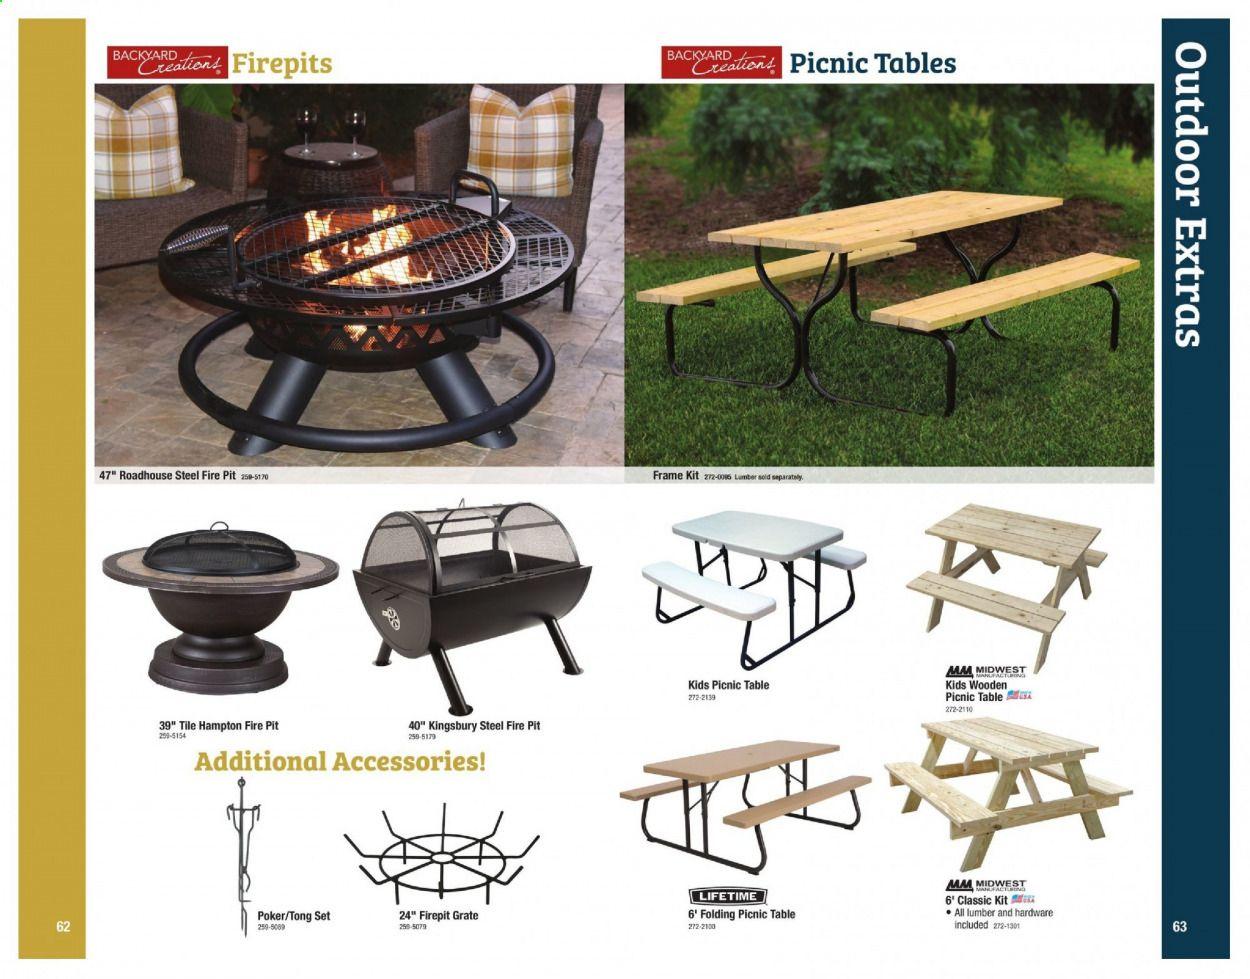 Menards Outdoor Living Catalog 2021 - Page 32